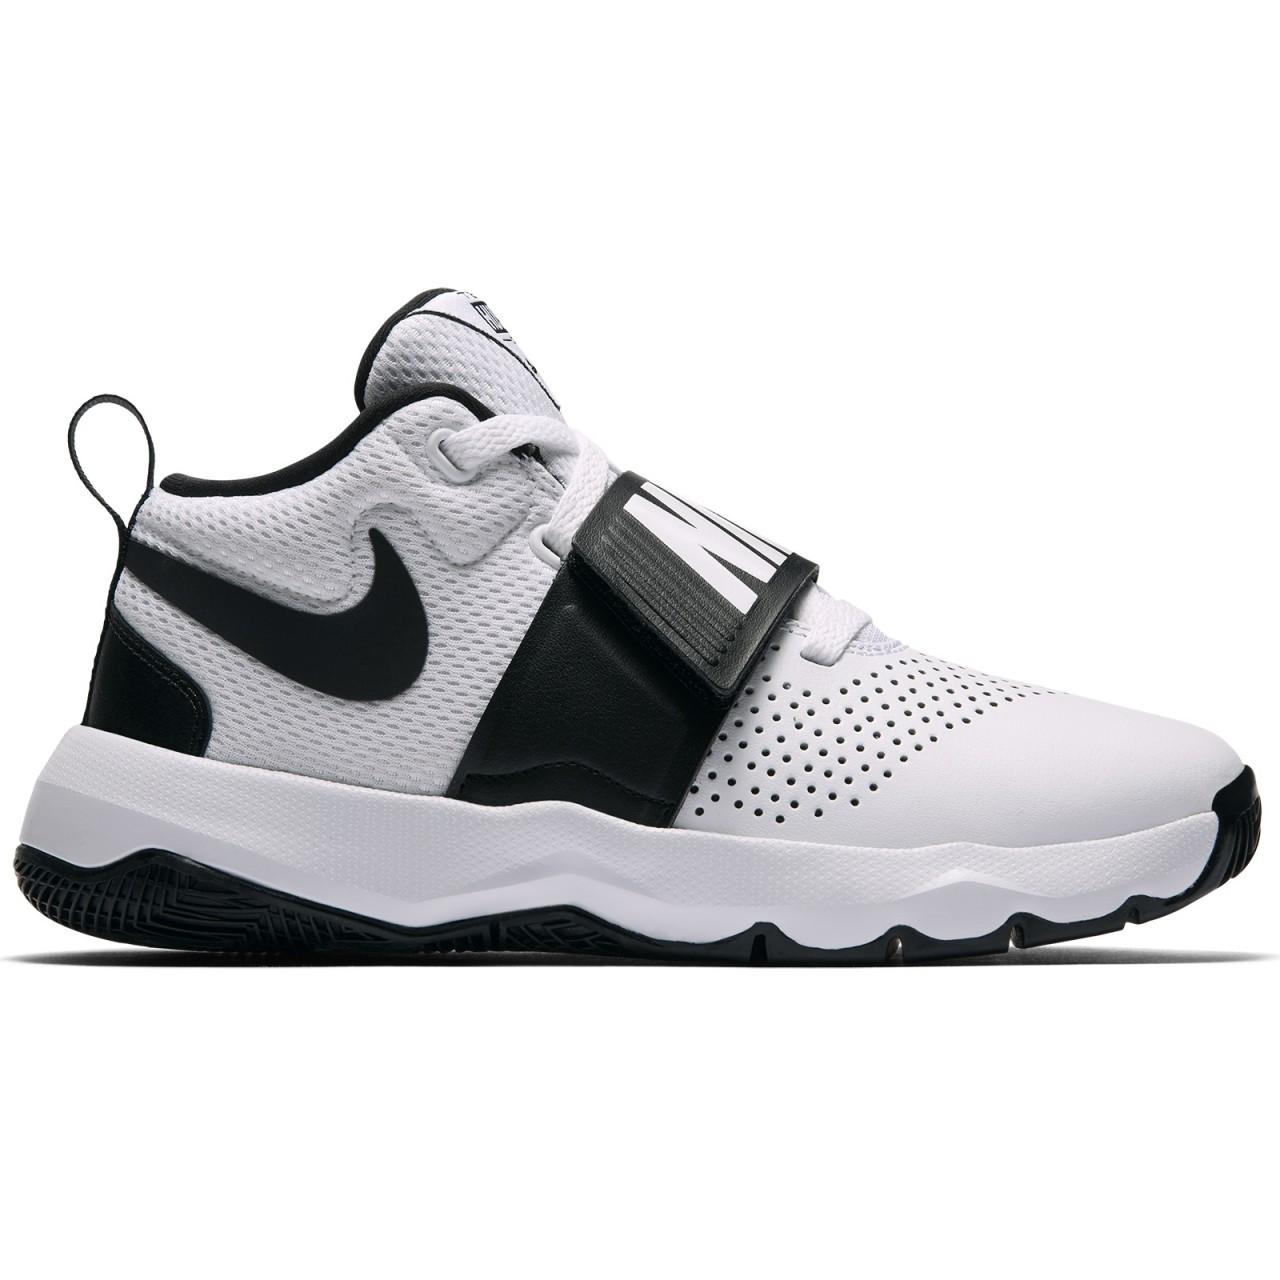 Nike Team Hustle D8 Basket Bimbo 881942 100 - LOMBARDI CALZATURE ... 2539096071c